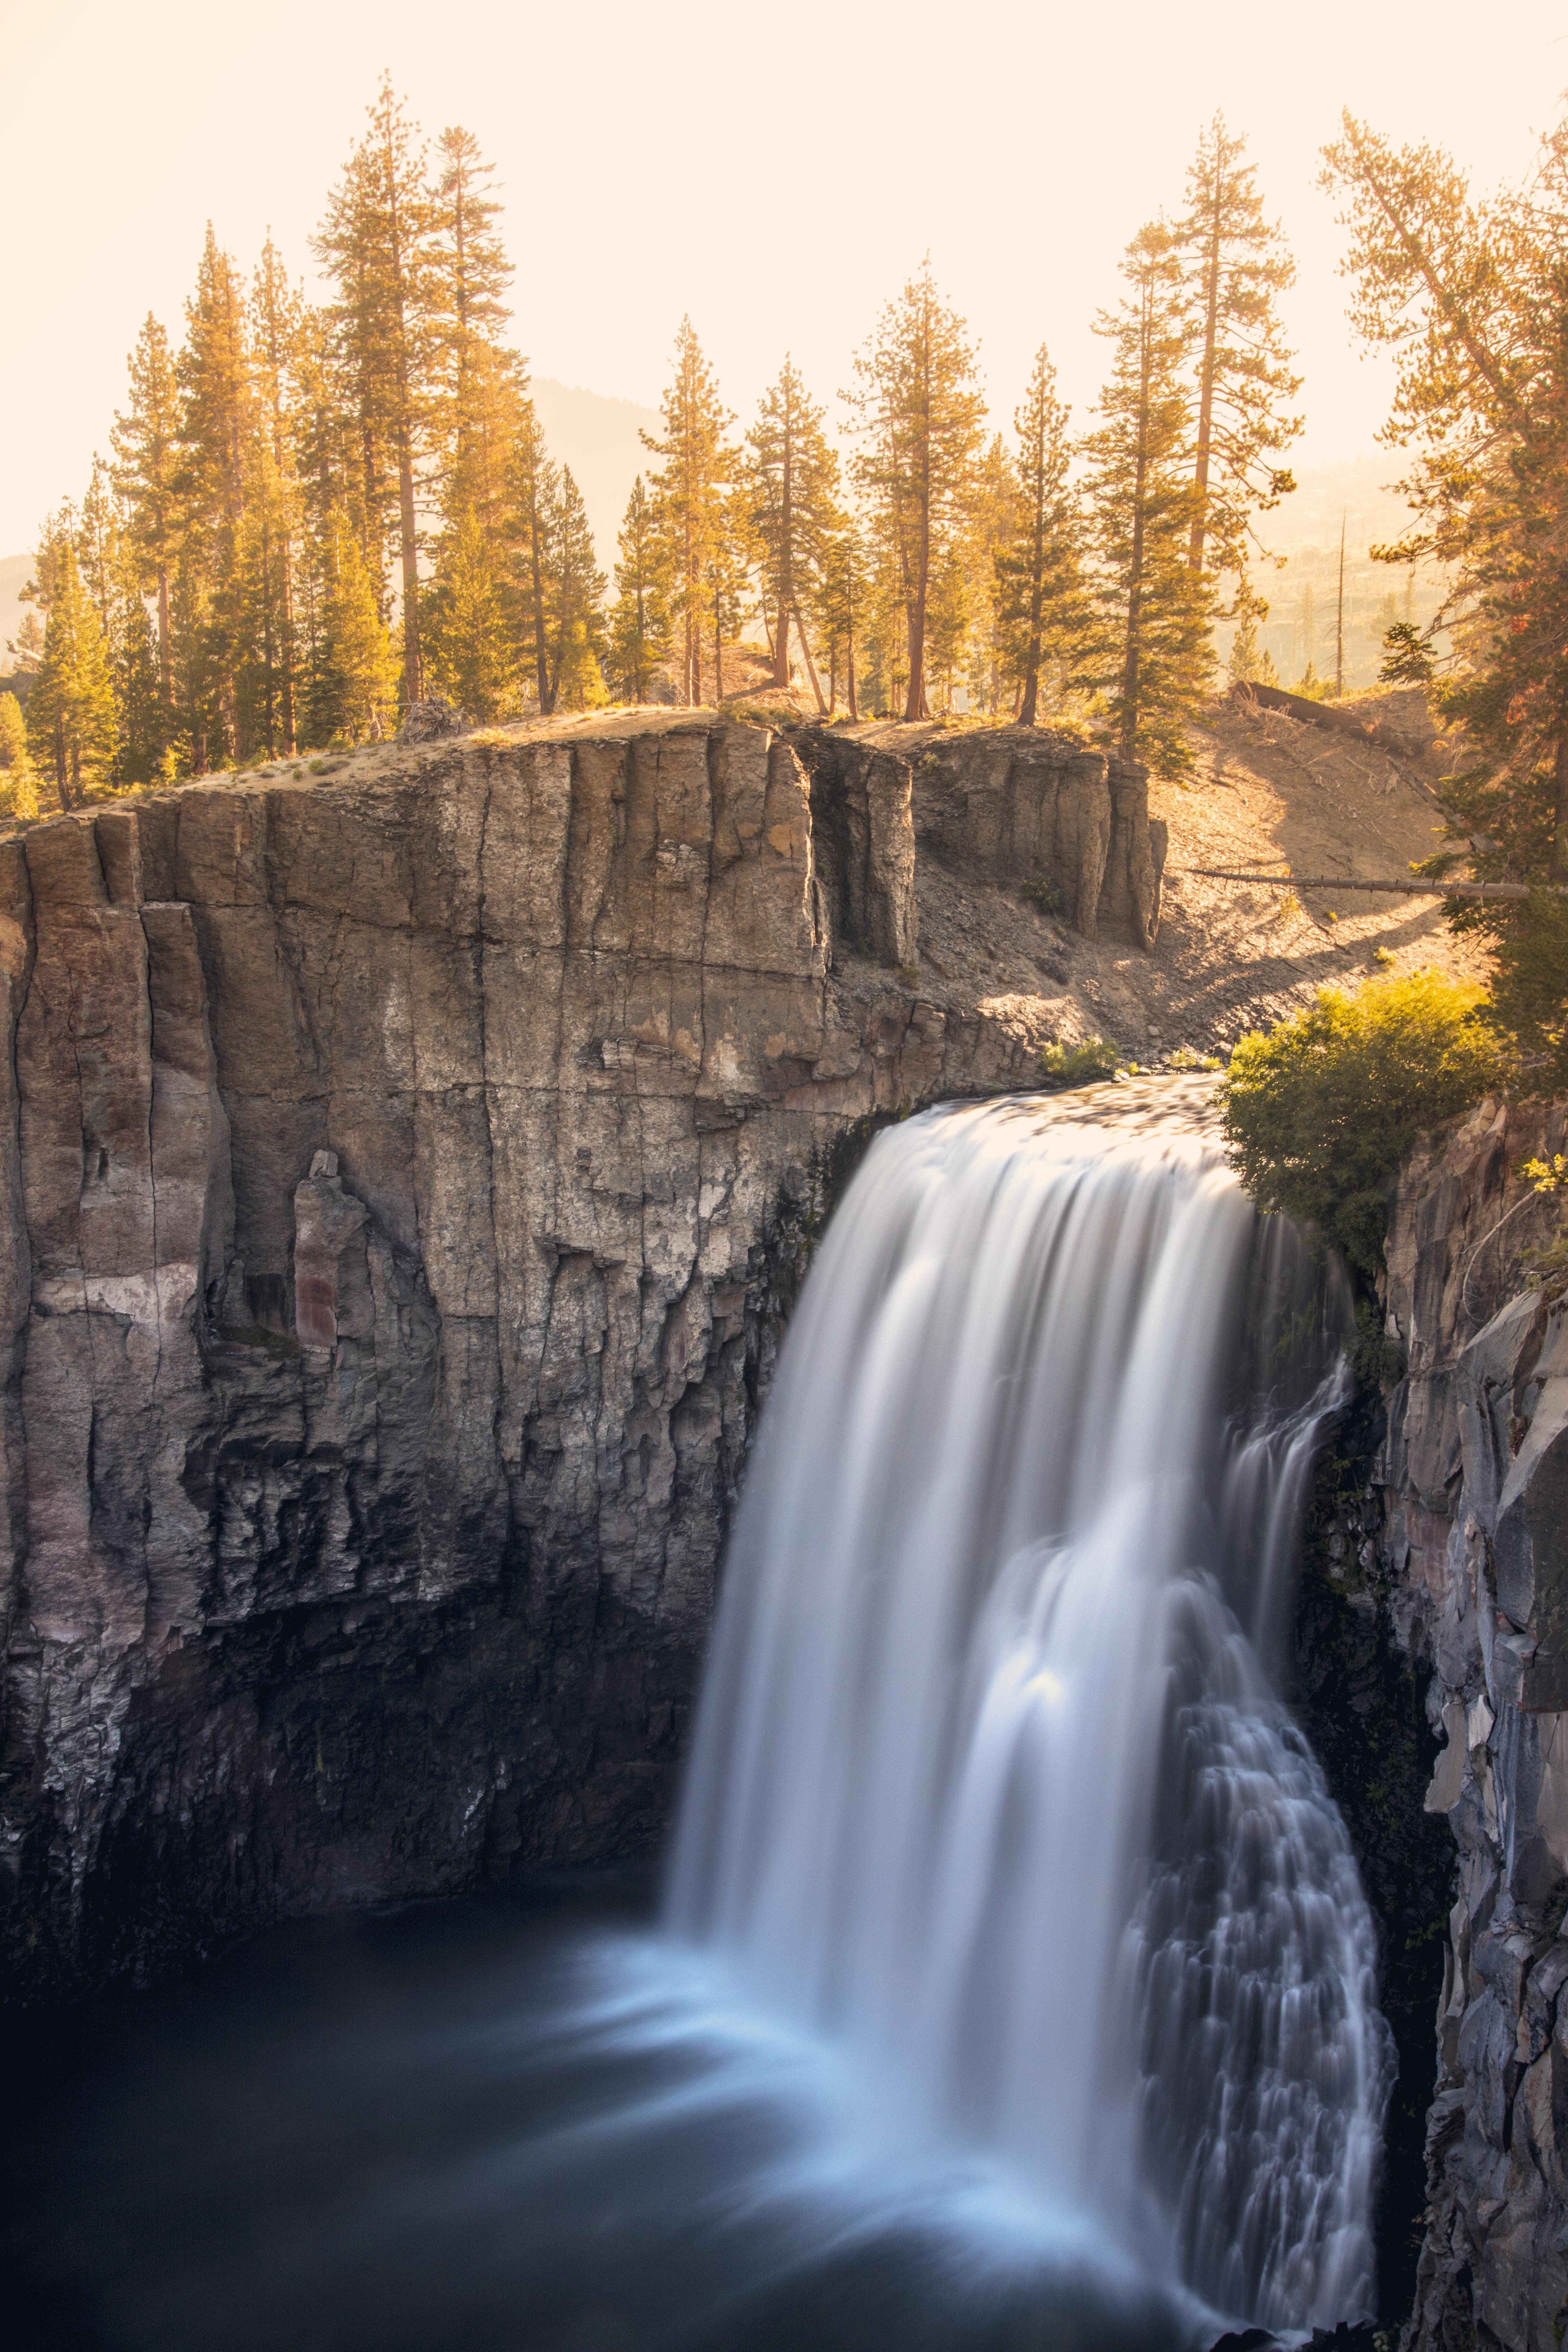 Rainbow Falls in California's Eastern Sierra. Formerly part of Yosemite National Park. [OC] [4480 x 6720] #rainbowfalls